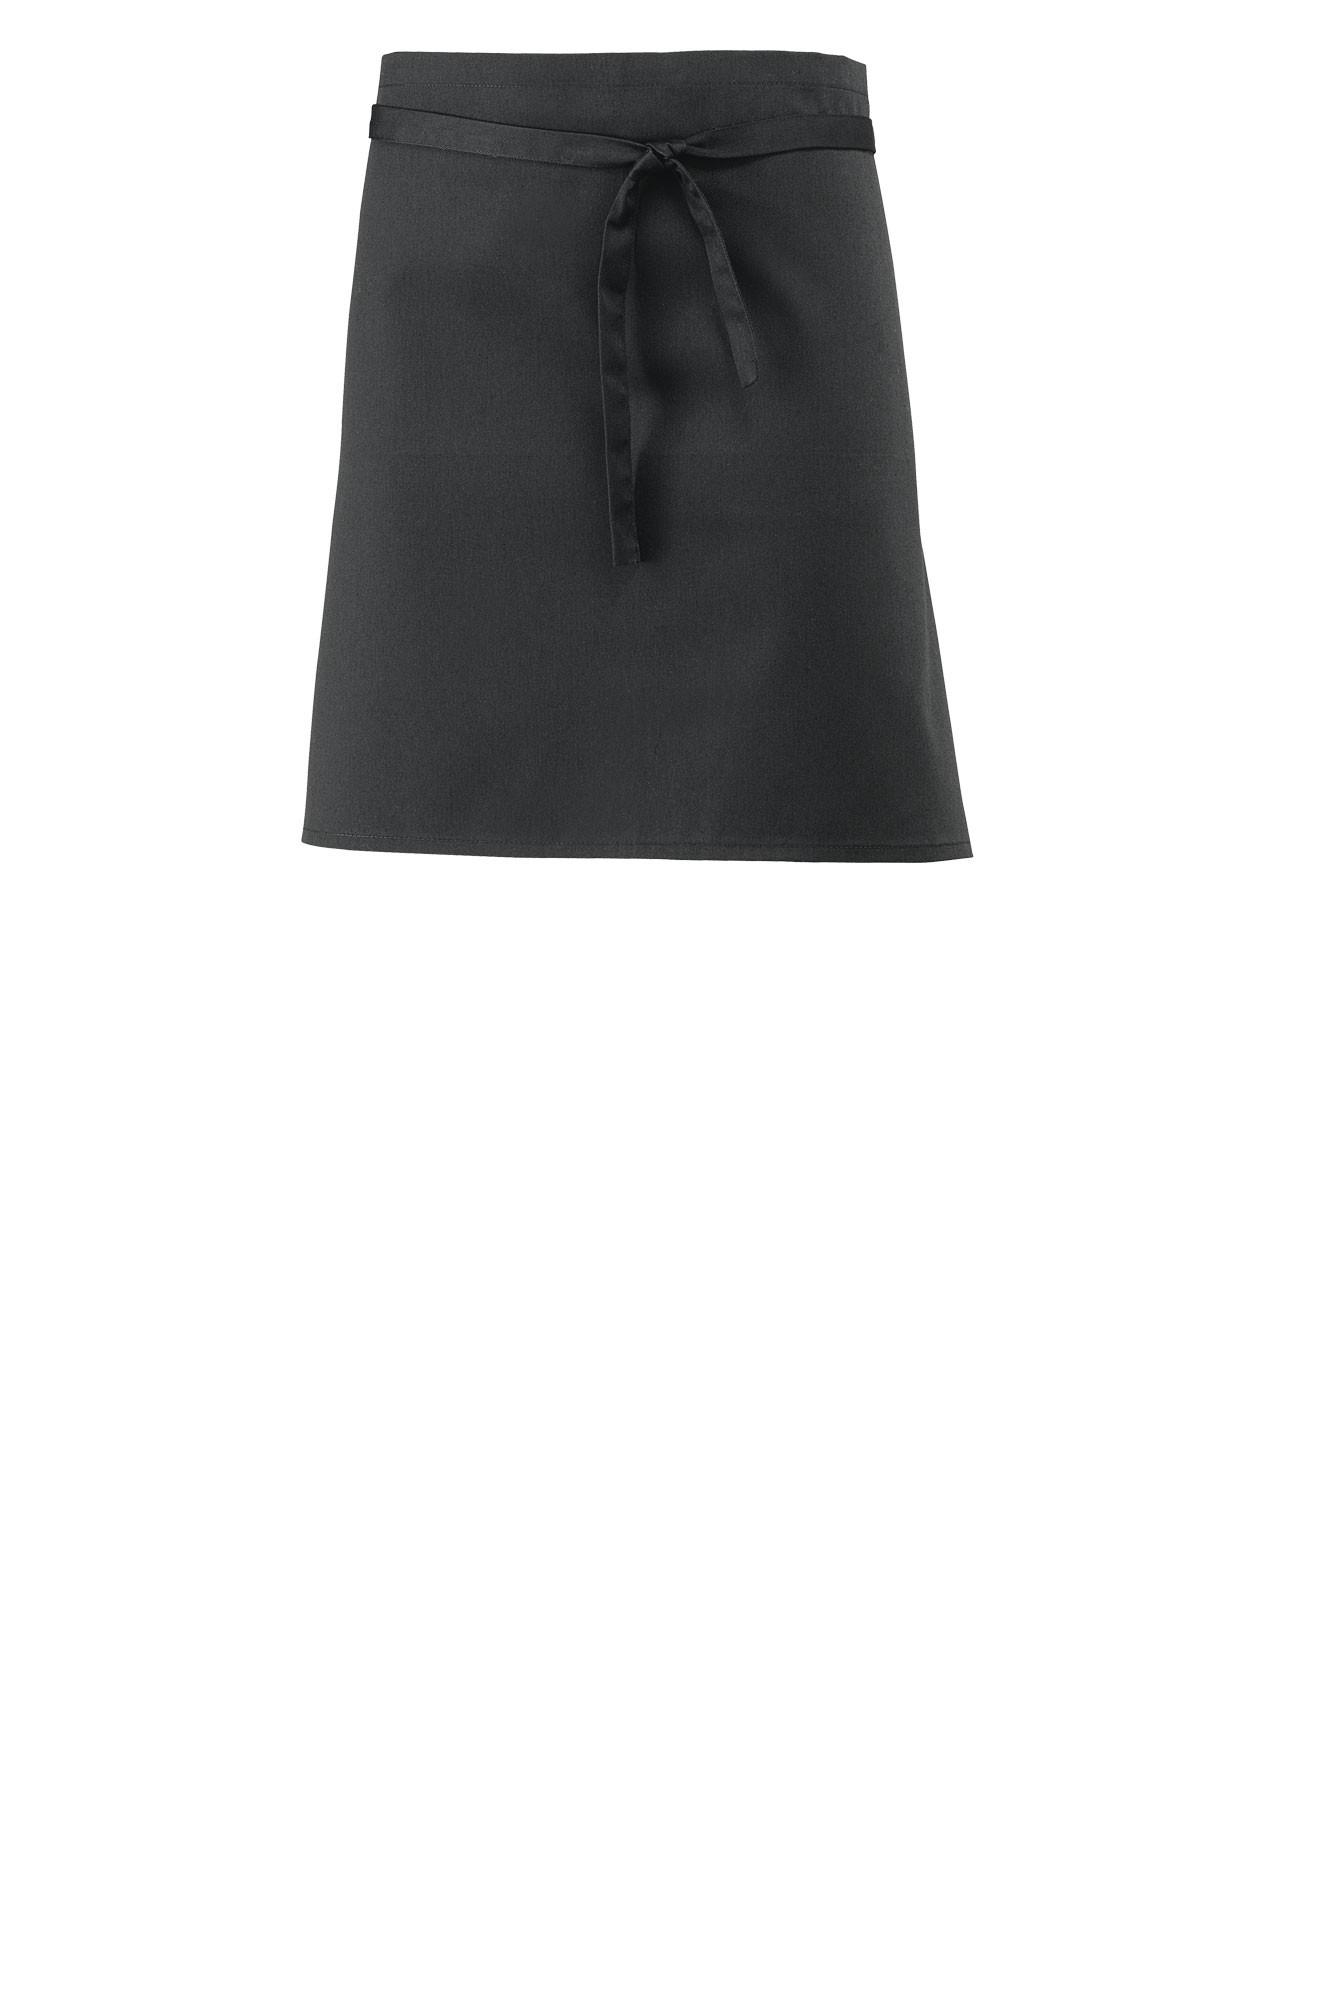 Zástěra Nikita - černá, 45x80 cm